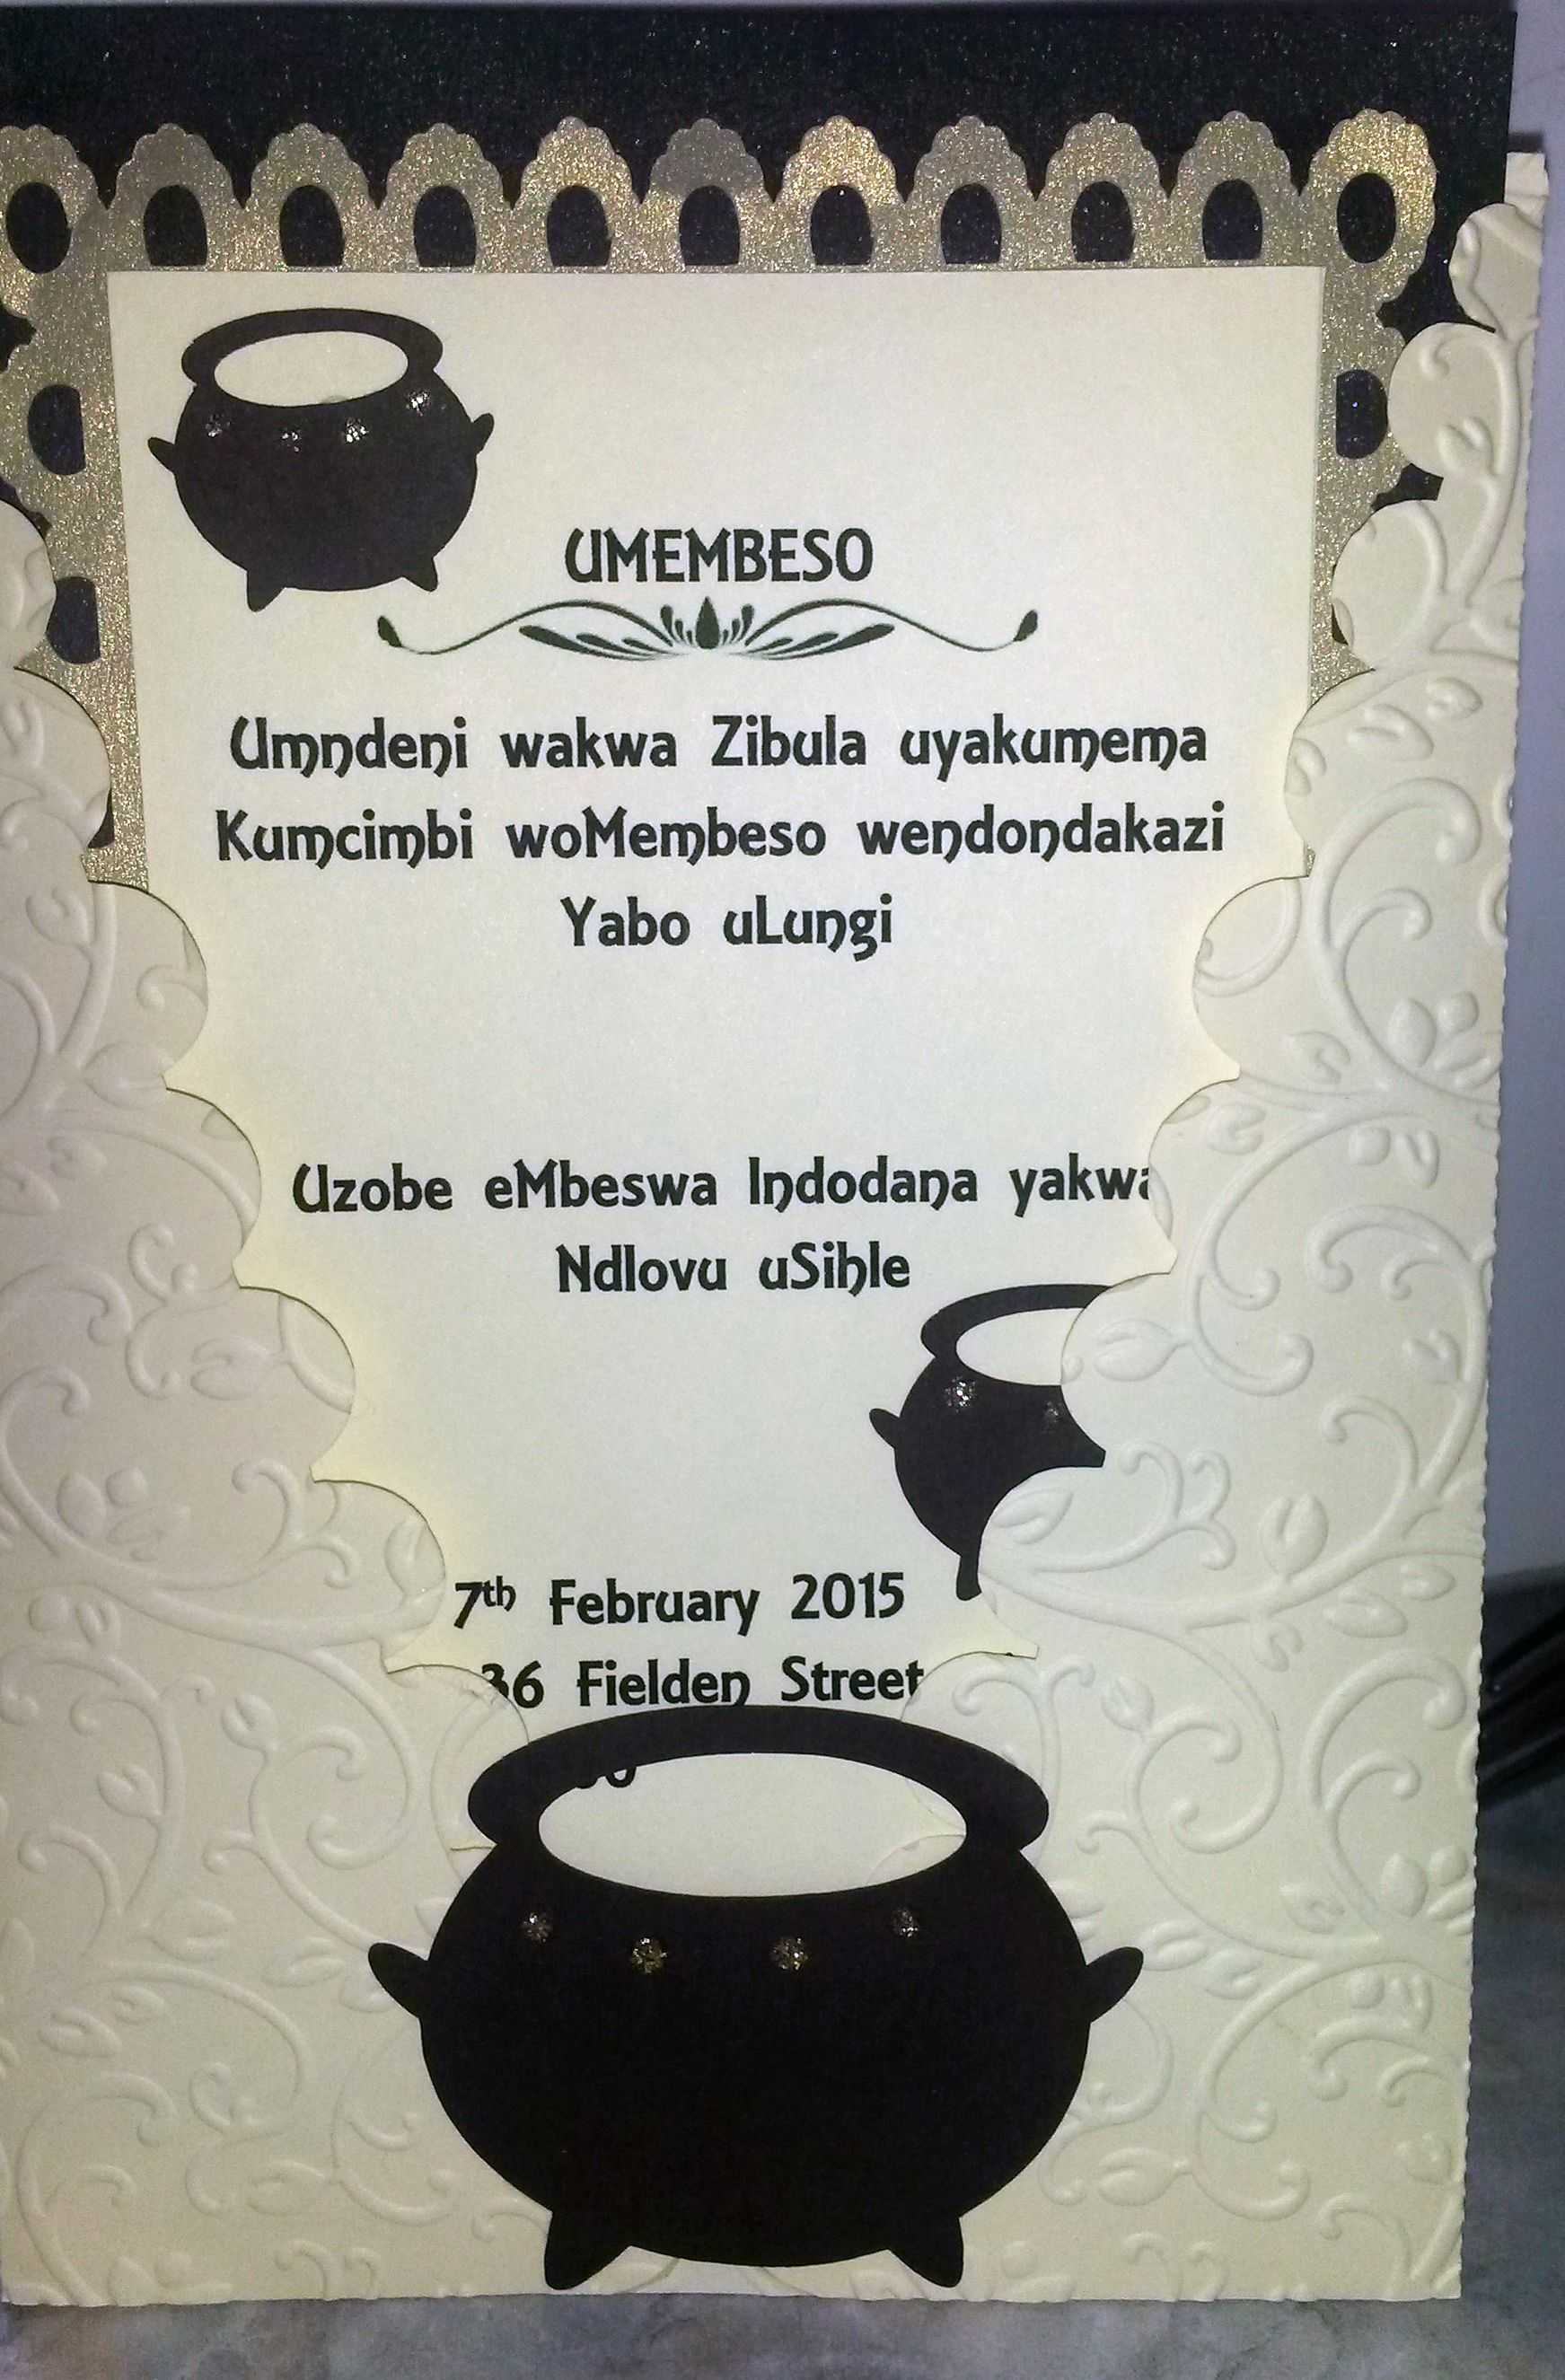 South African Zulu Traditional wedding invitation Card – Traditional Wedding Invitation Cards Designs